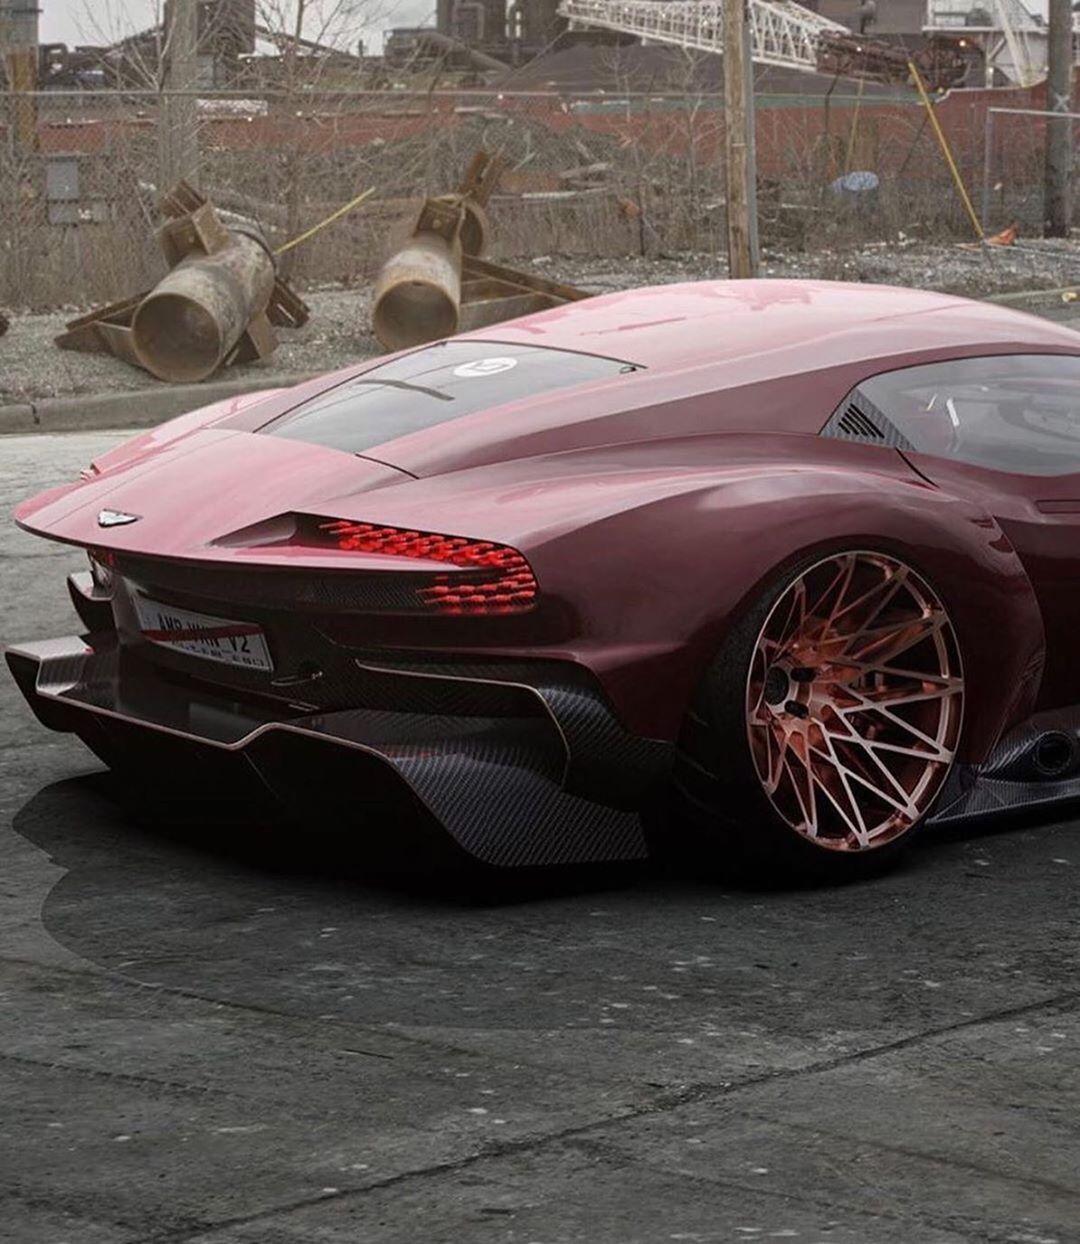 Supercars Exotics On Instagram Aston Martin Vulcan Follow Us Dream Whipz For More Yasiddesign Aston Martin Vulcan Super Cars Aston Martin